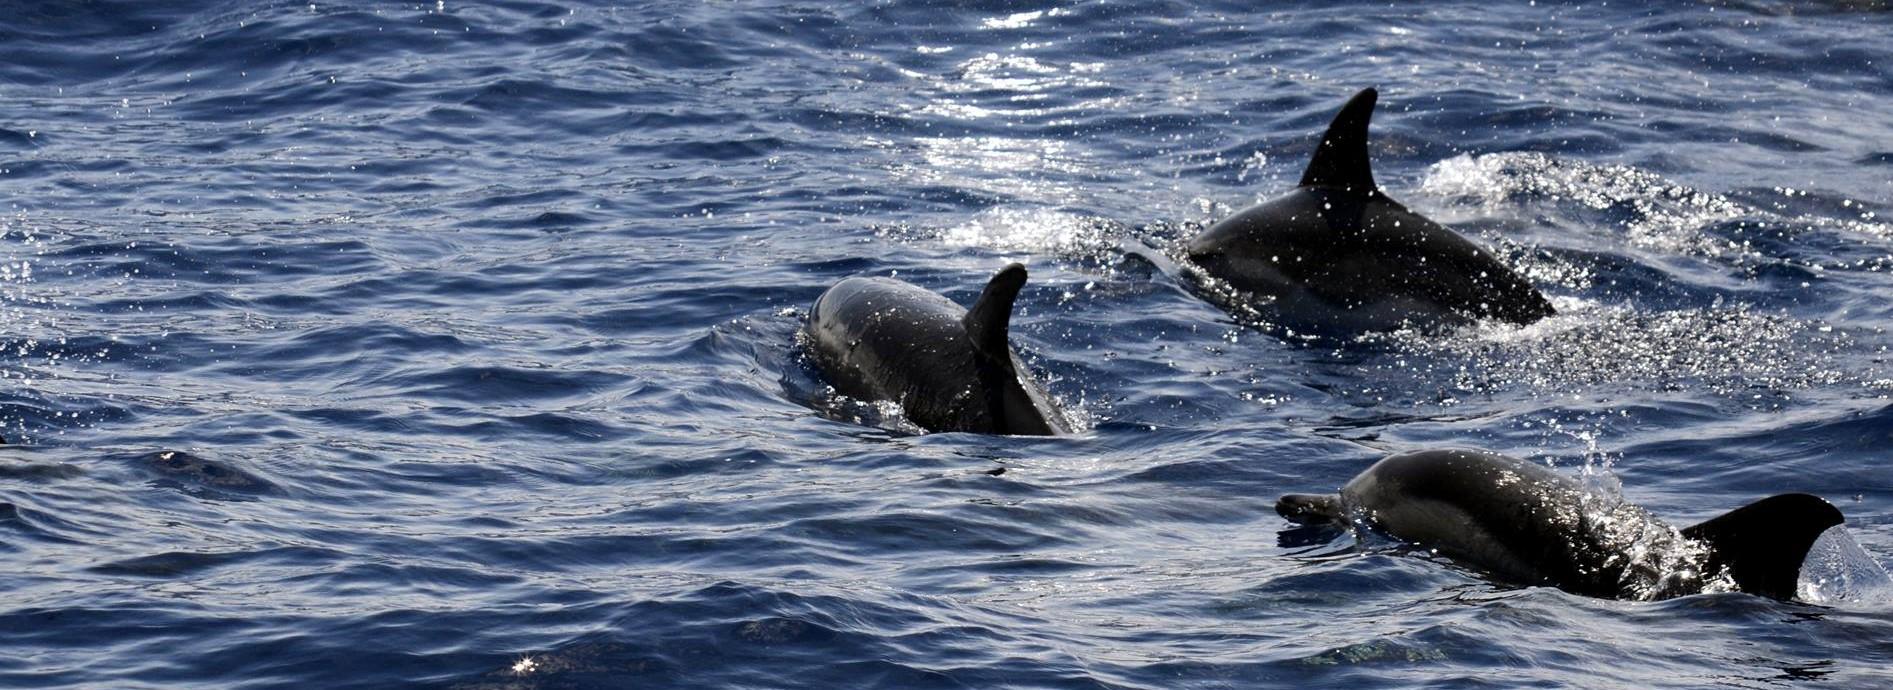 Faial & Pico: Meeressäuger im Nichts des Atlantiks [mehr...]